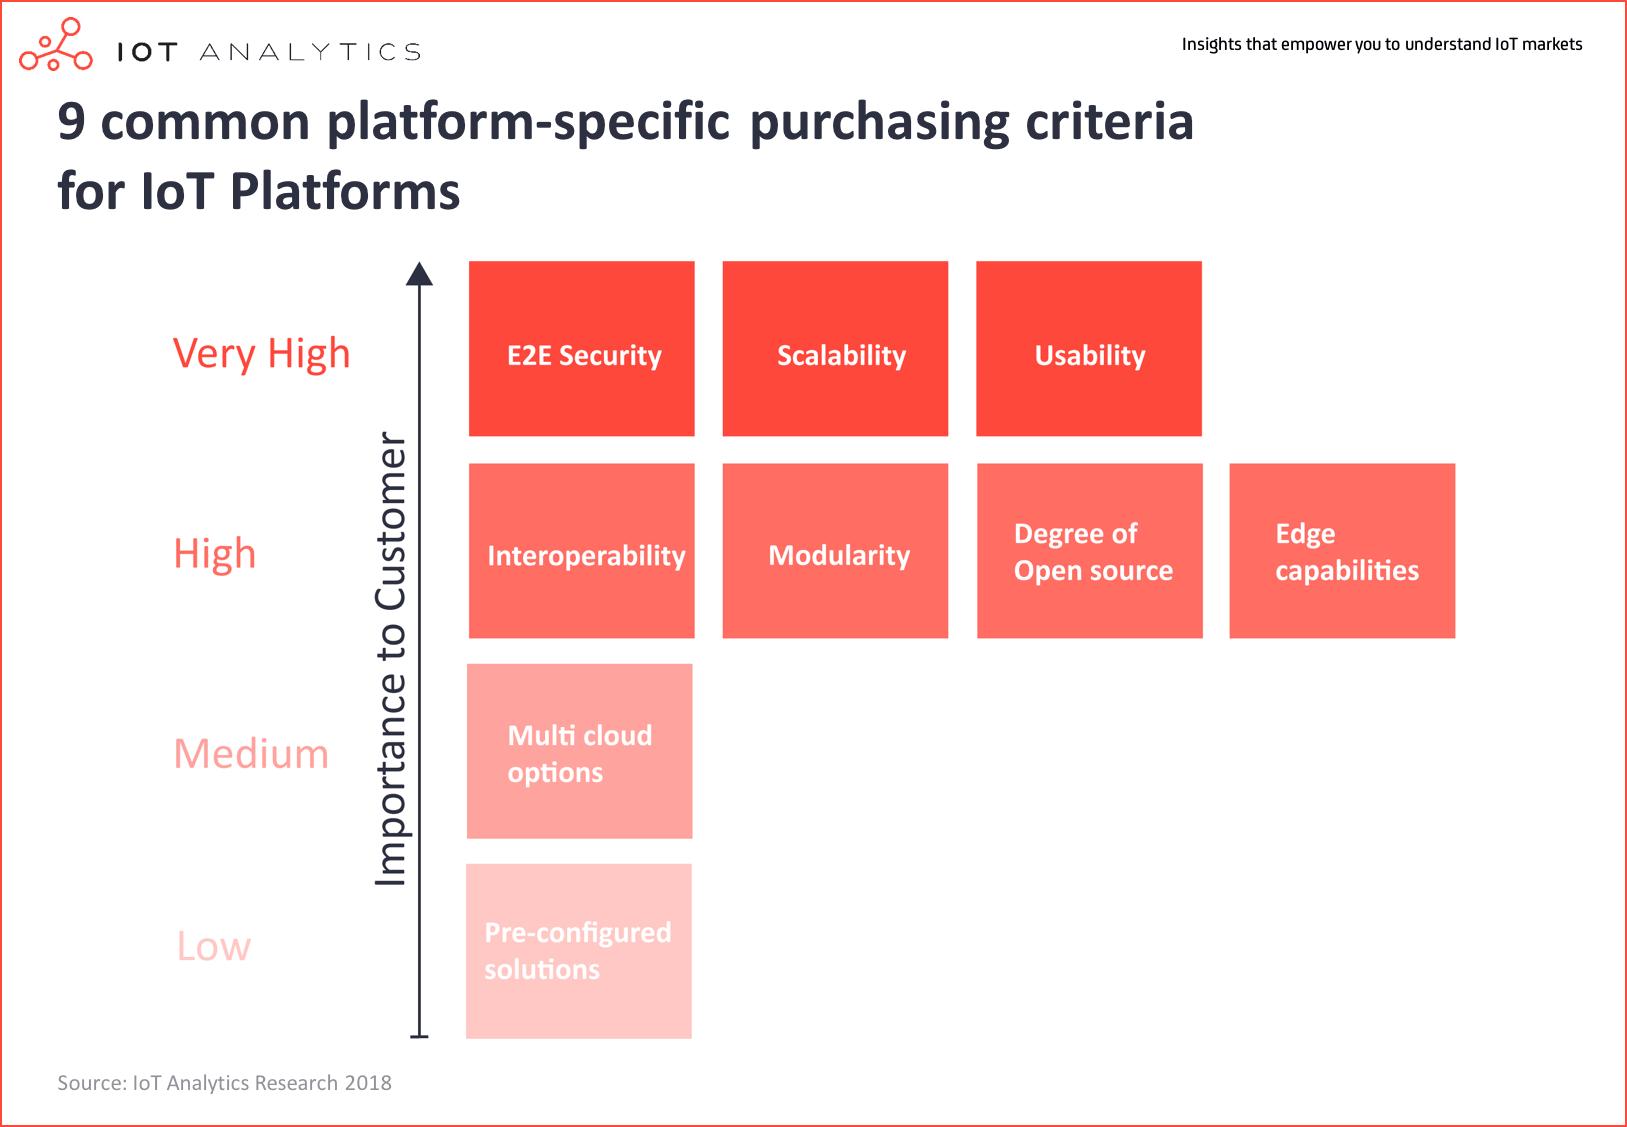 9 common platform-specific purchasing criteria for IoT Platforms